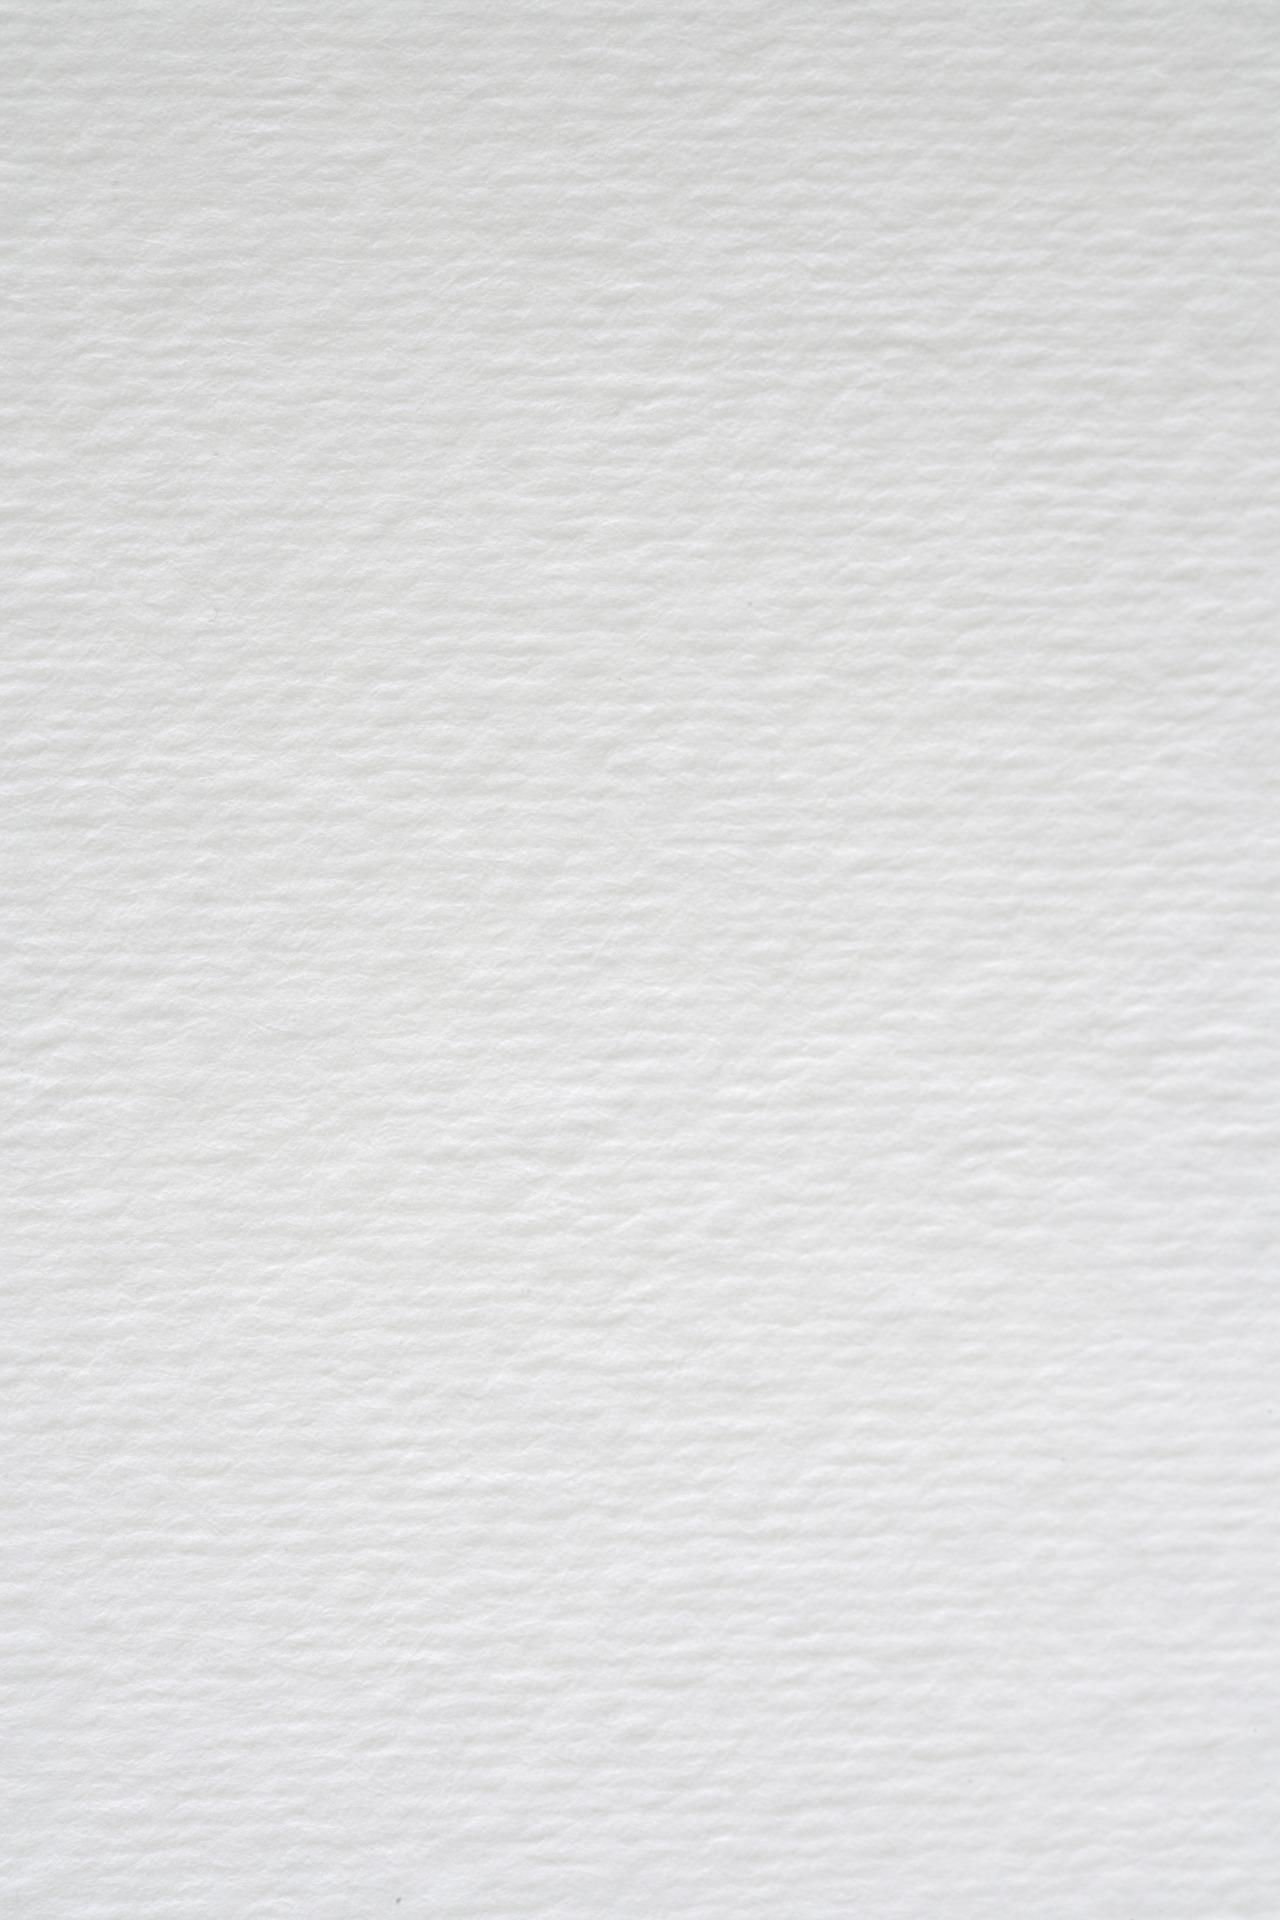 papertexture-2061709_1920